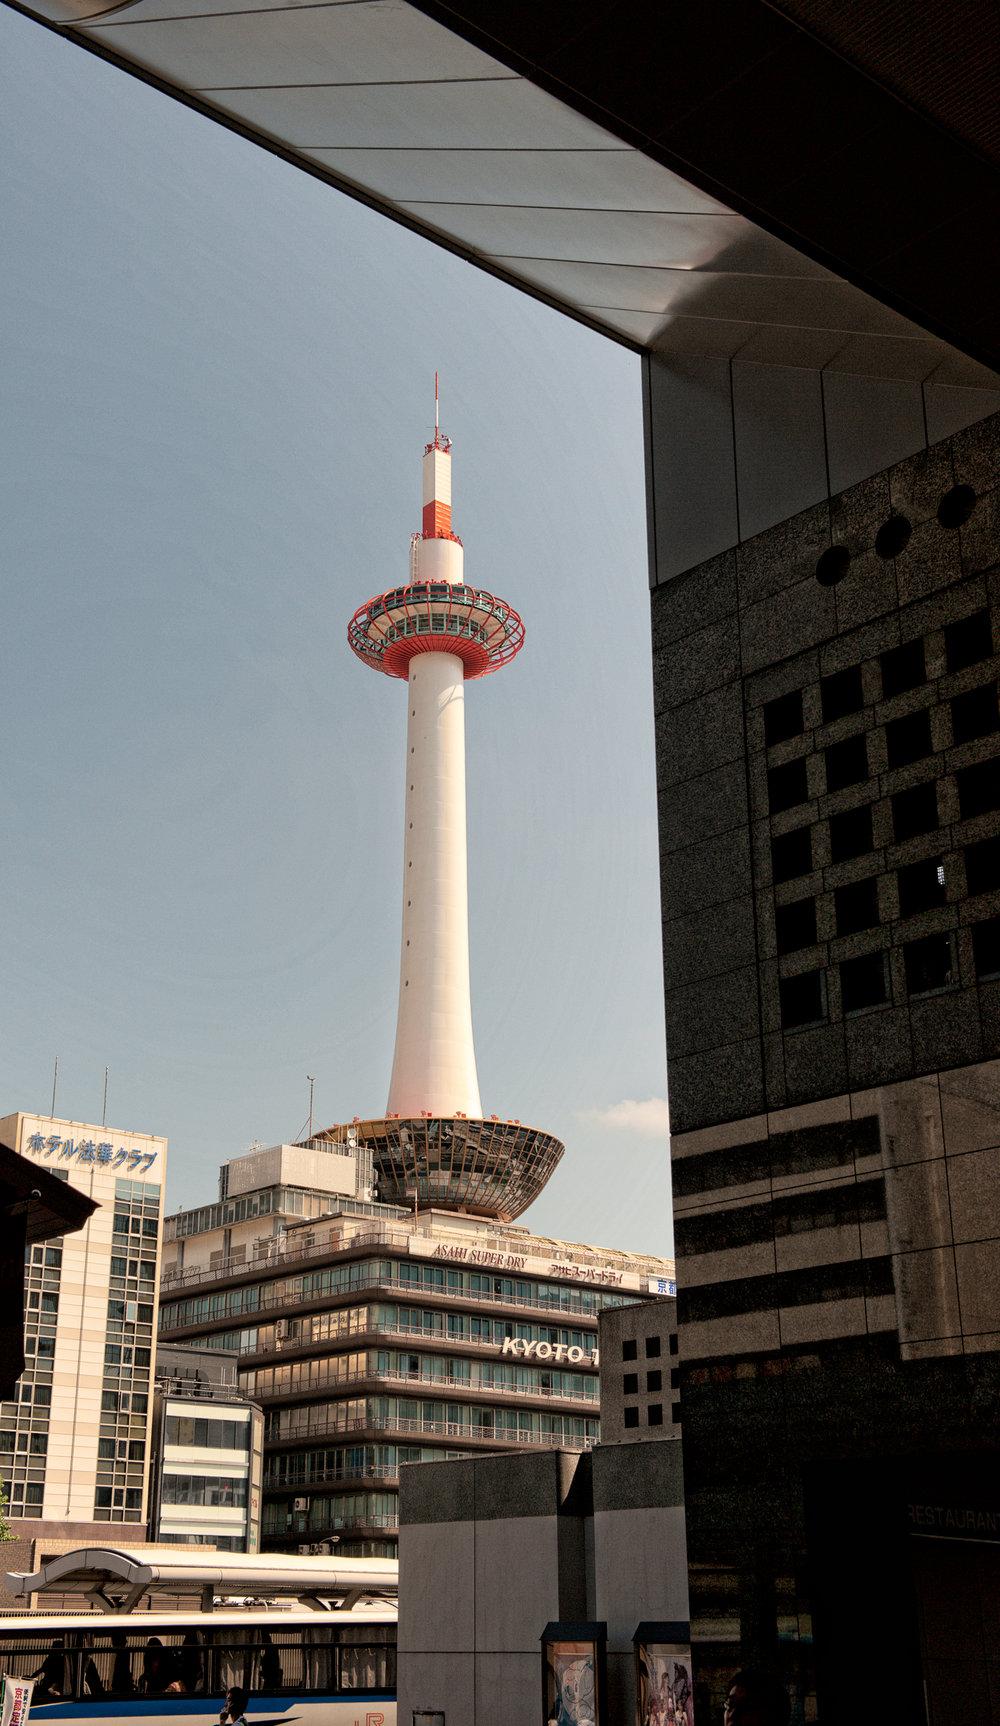 Japan-John Bardell-0366a.jpg